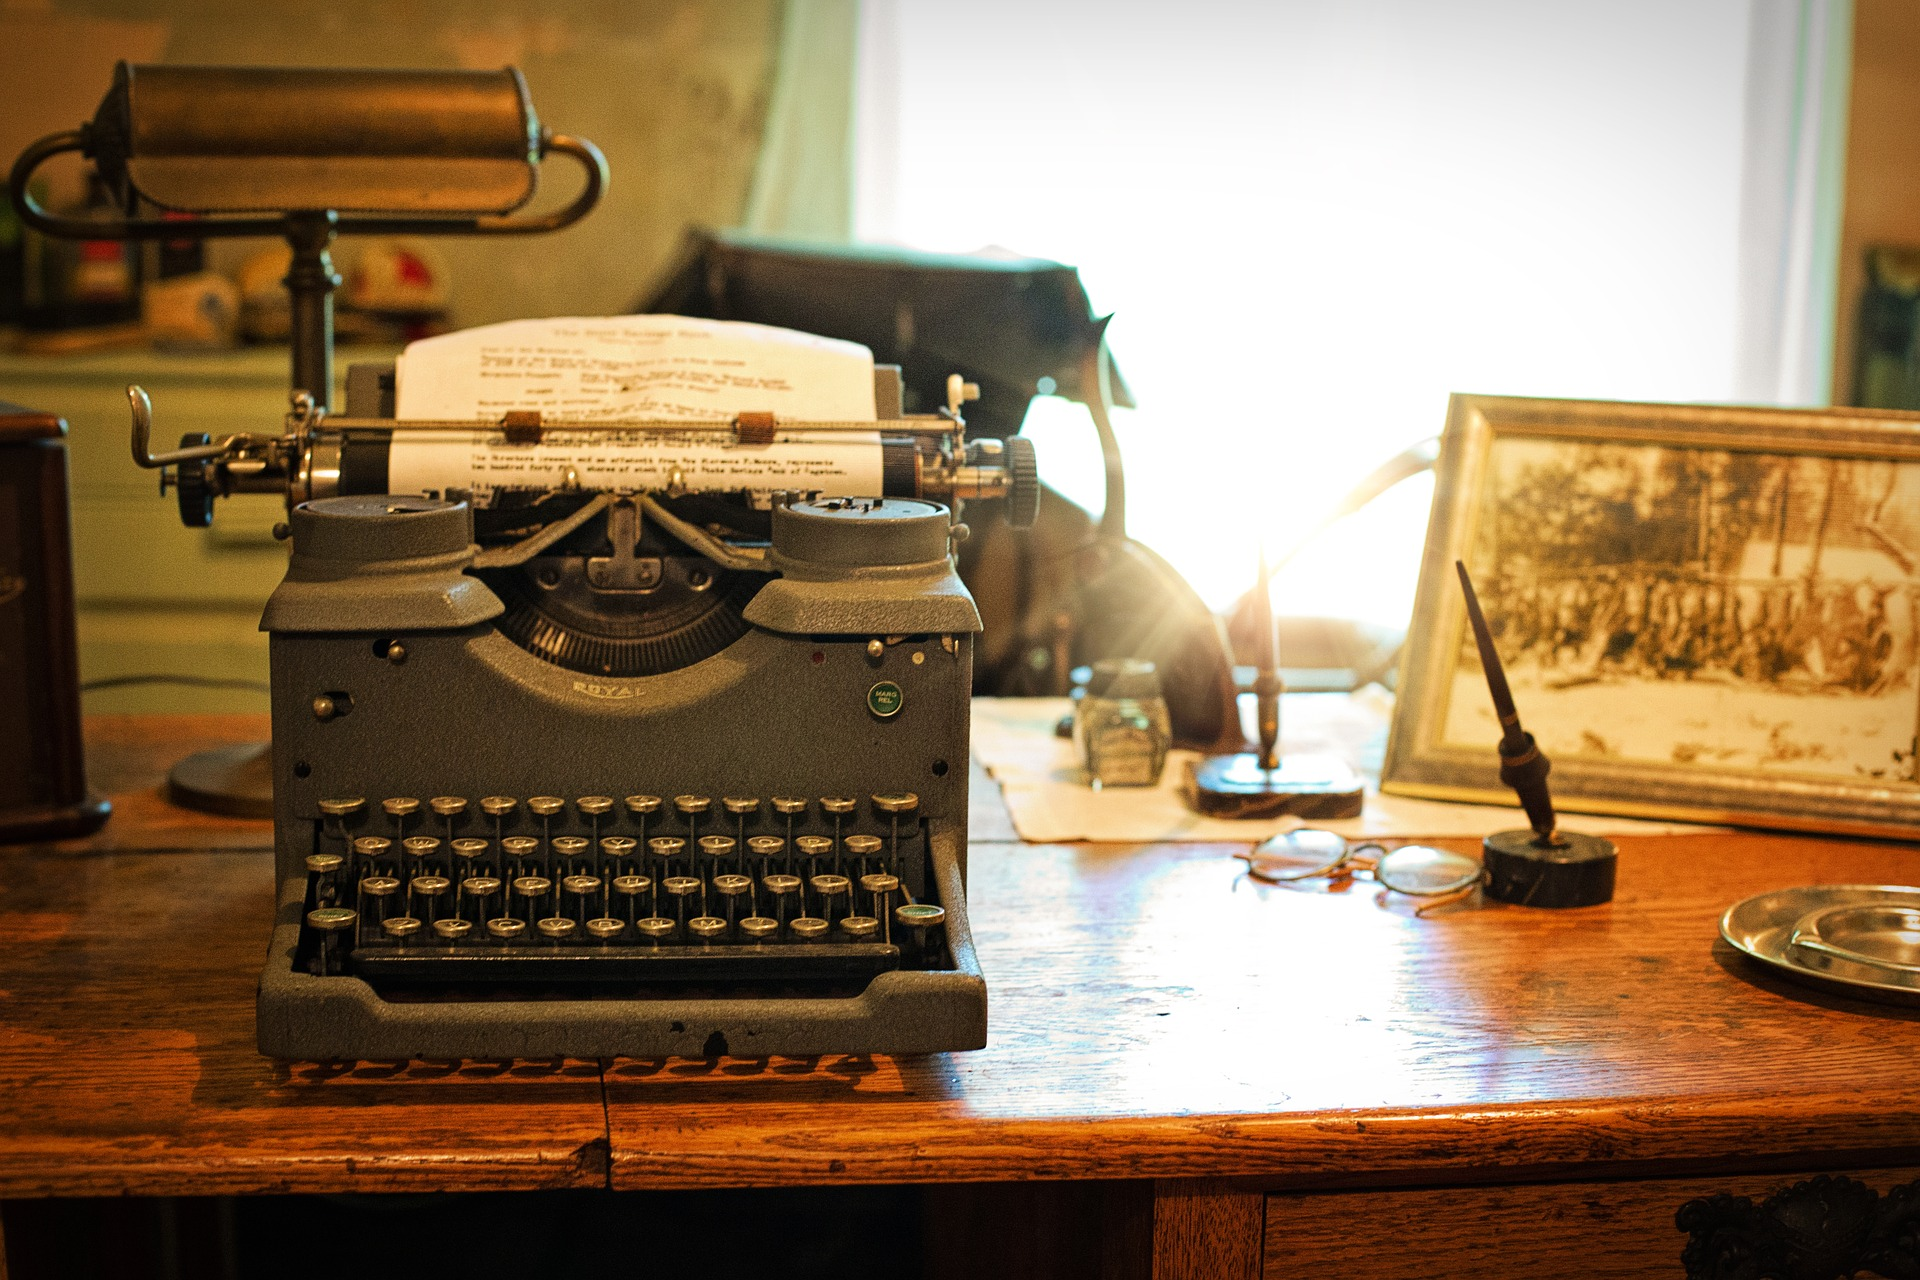 typewriter vintage office desk Jill Wellington Pixabay